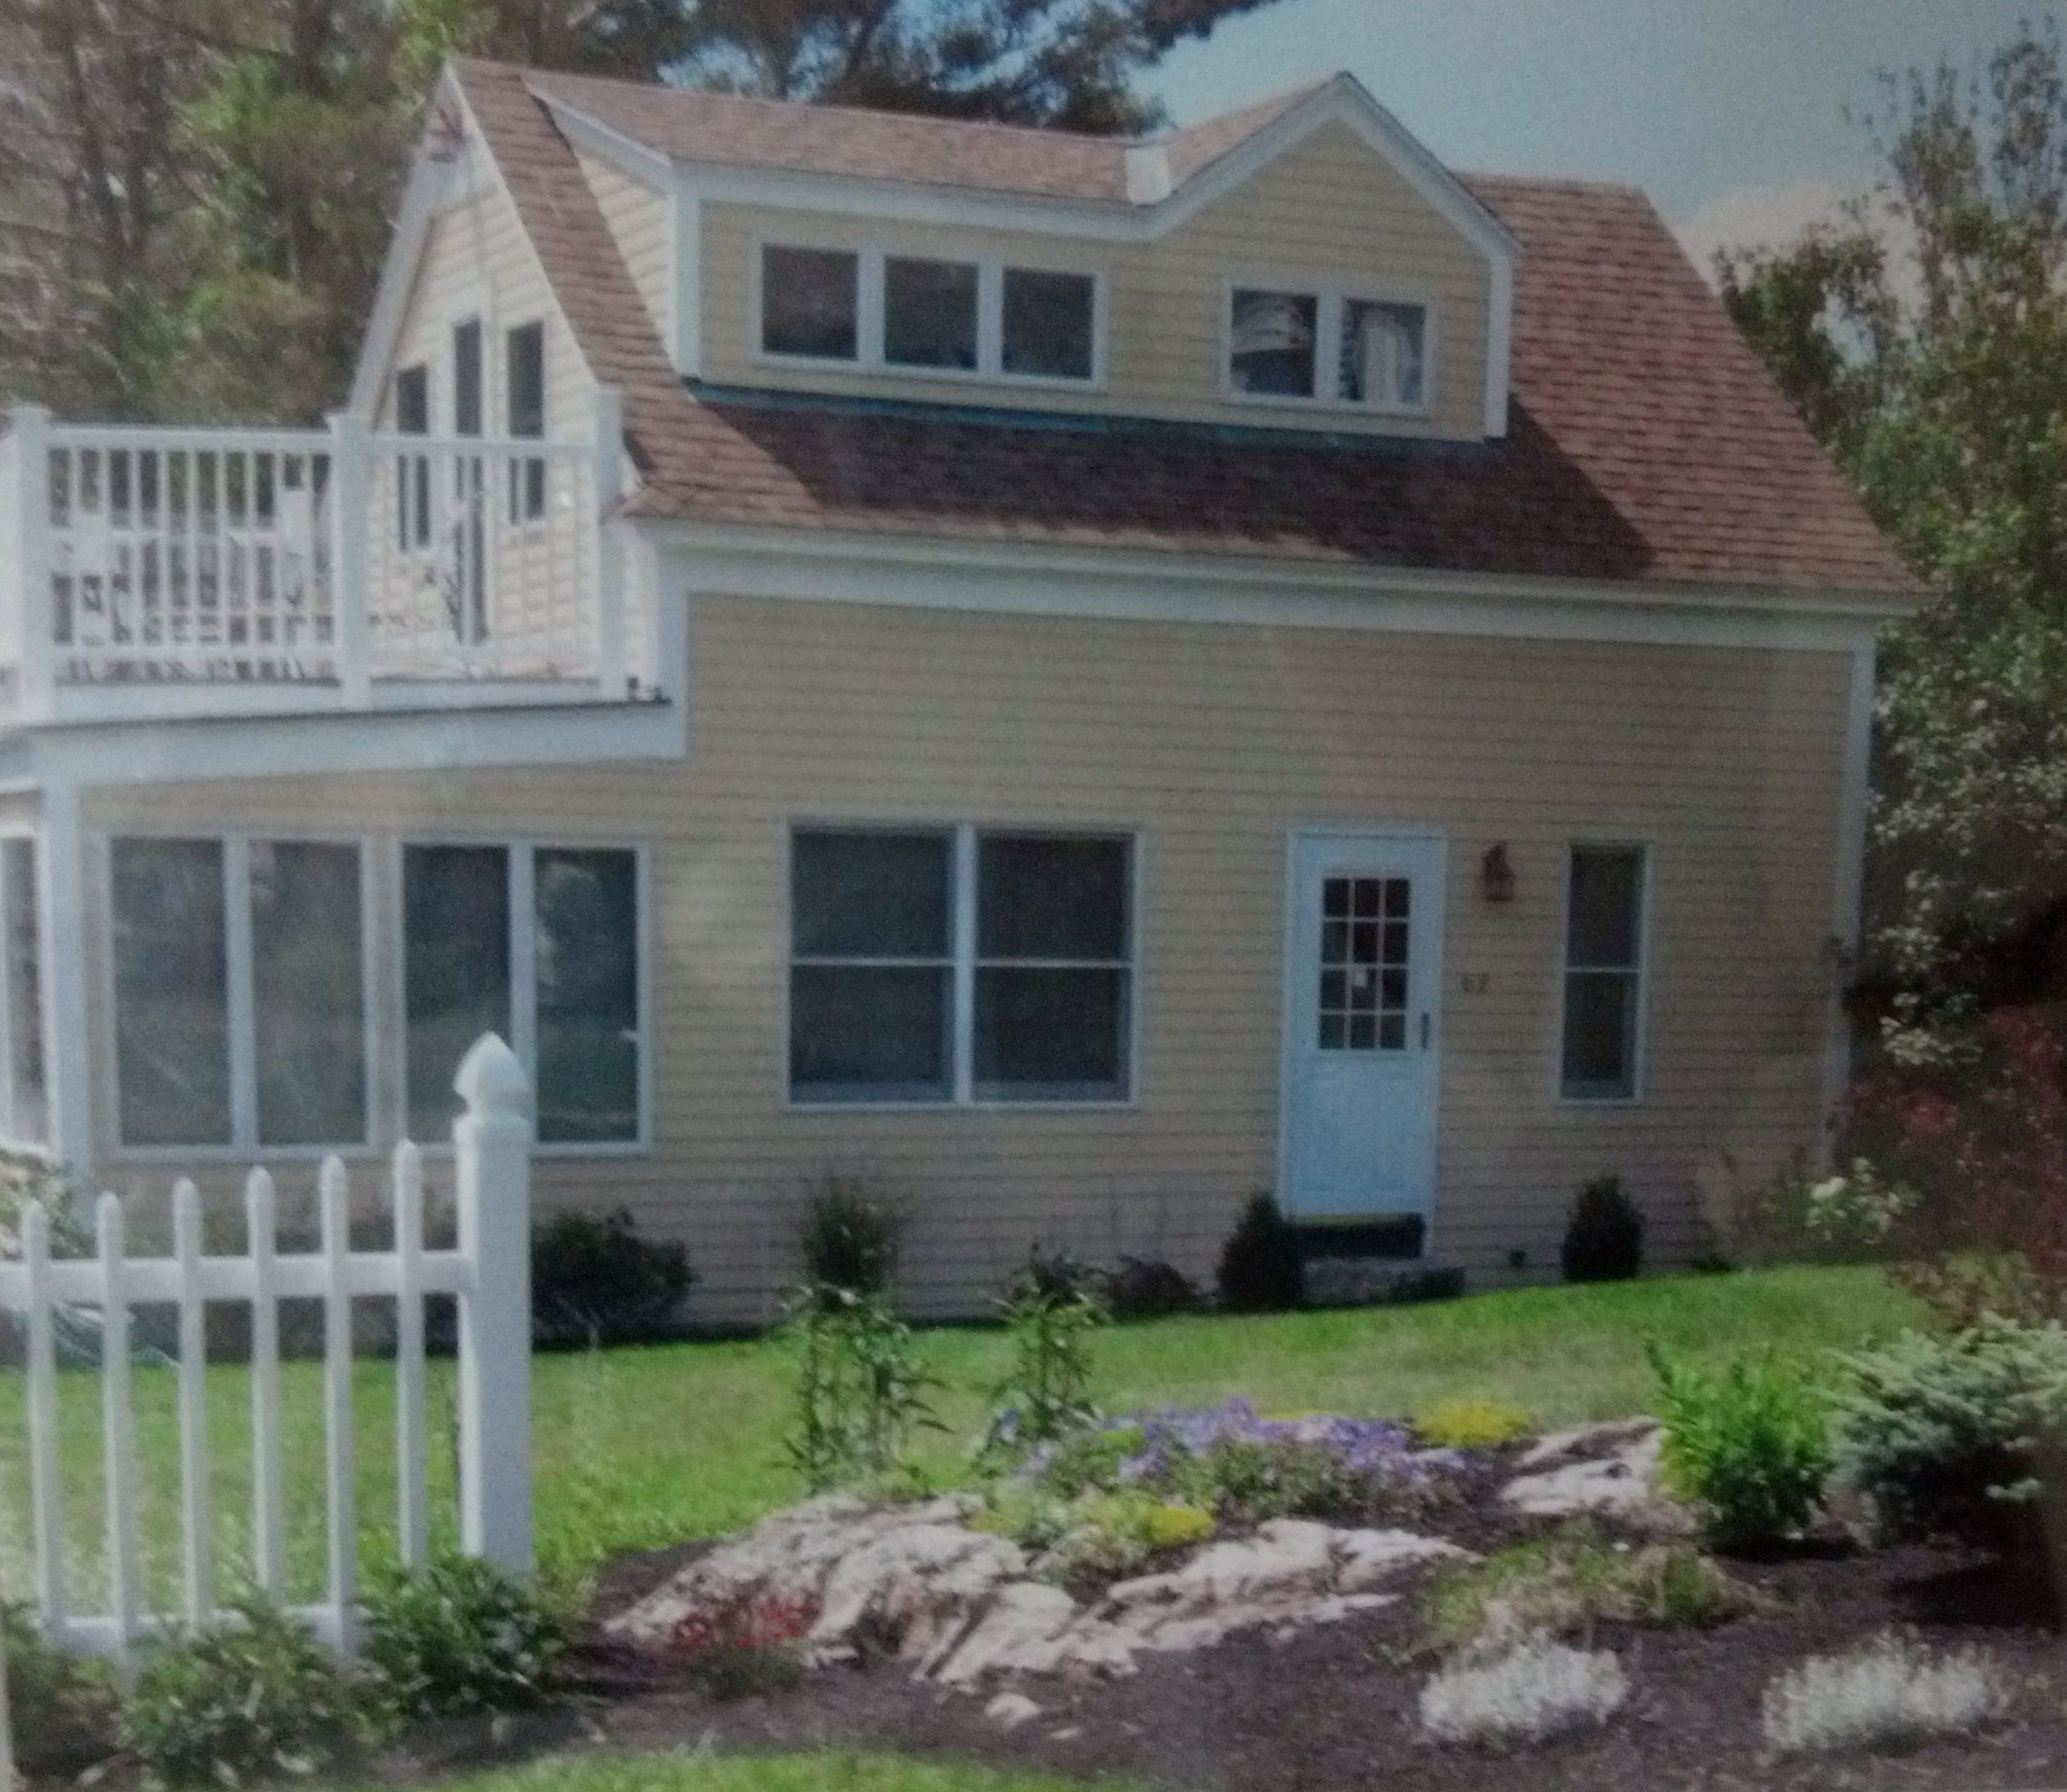 Cottages In Ogunquit Maine: #1326 Three Day Get-Away In Ogunquit Cottage